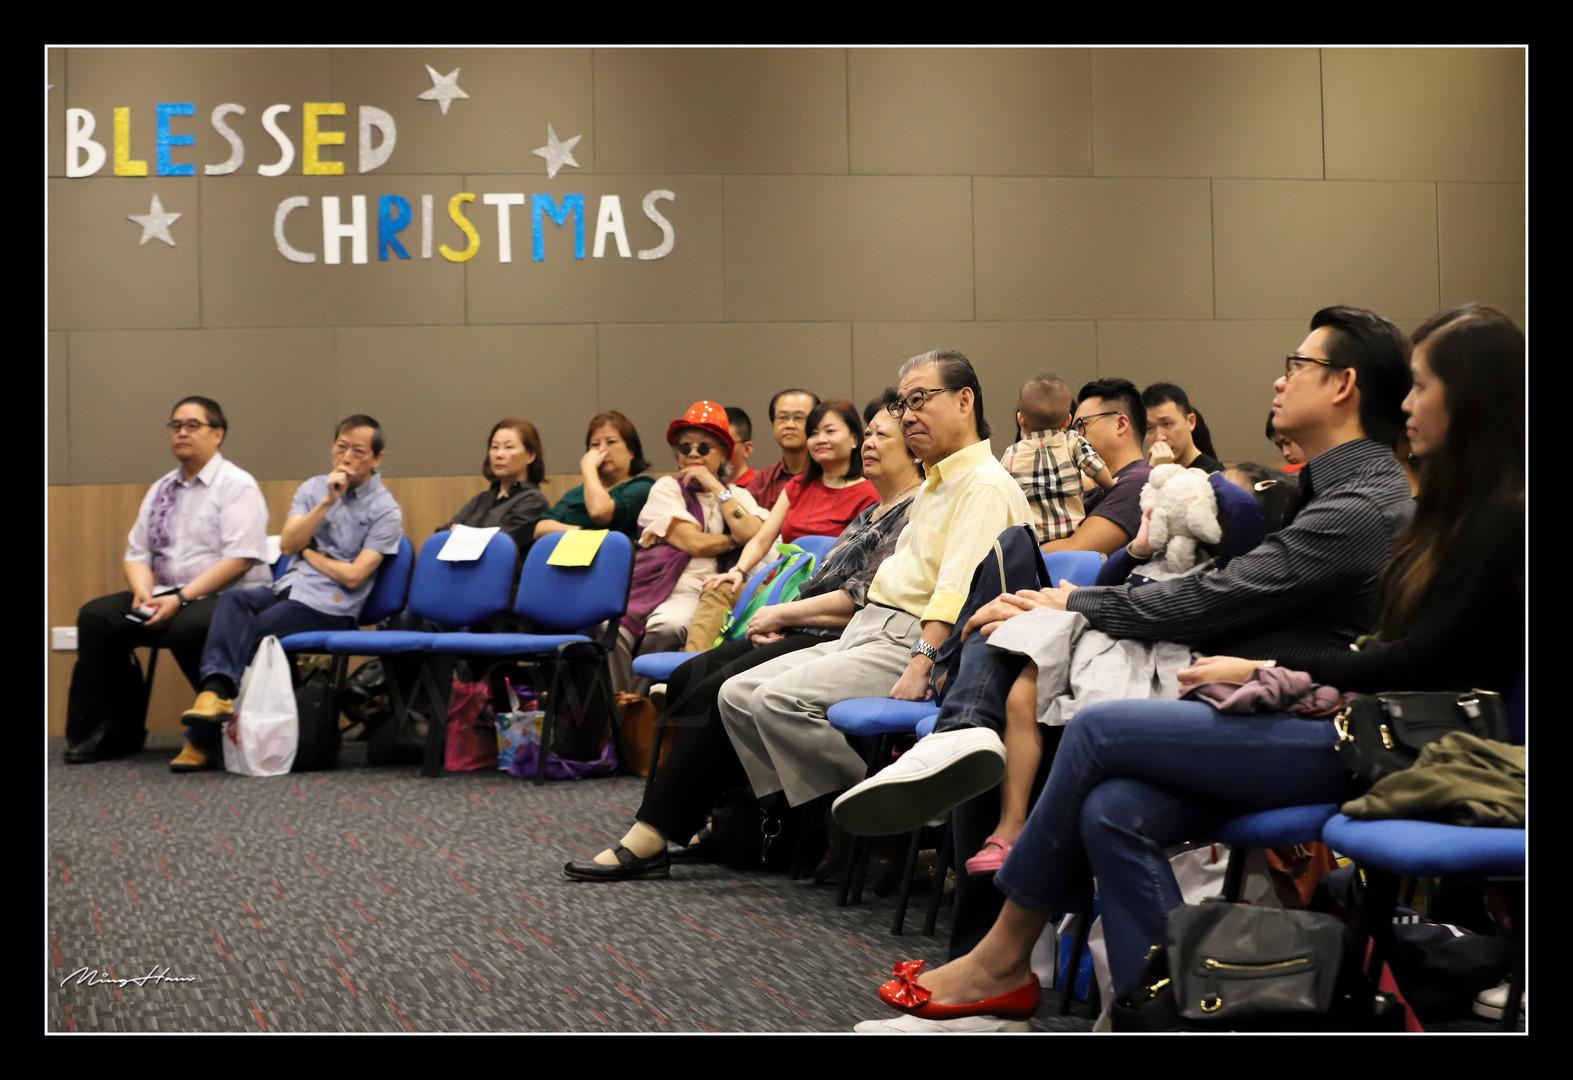 2018_Christmas_TWC church_3951.jpg